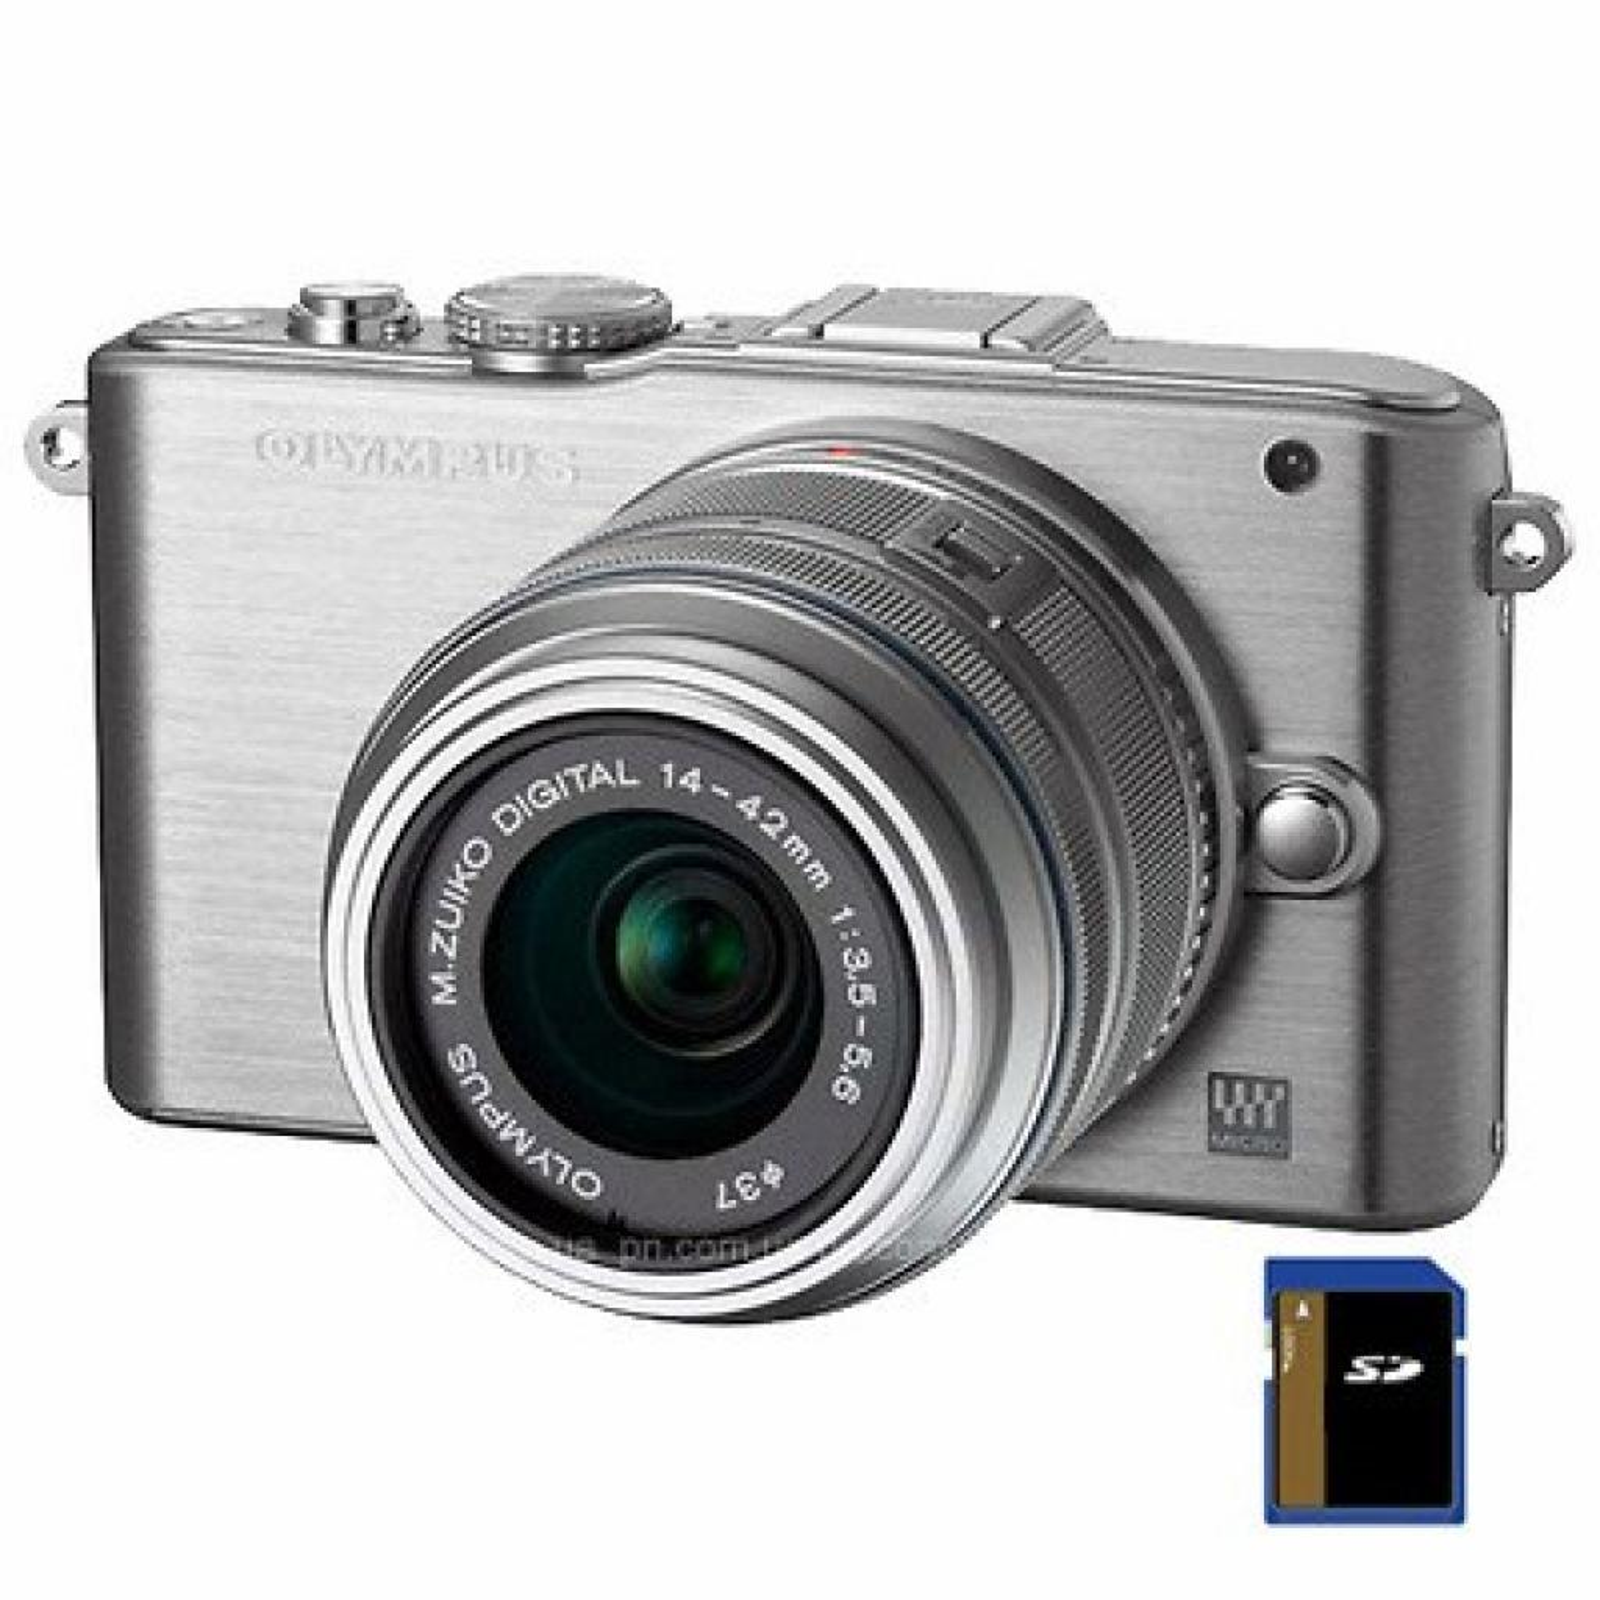 Цифровой фотоаппарат OLYMPUS PEN E-PL3 12-50 mm kit silver/silver (V20503FSE000)